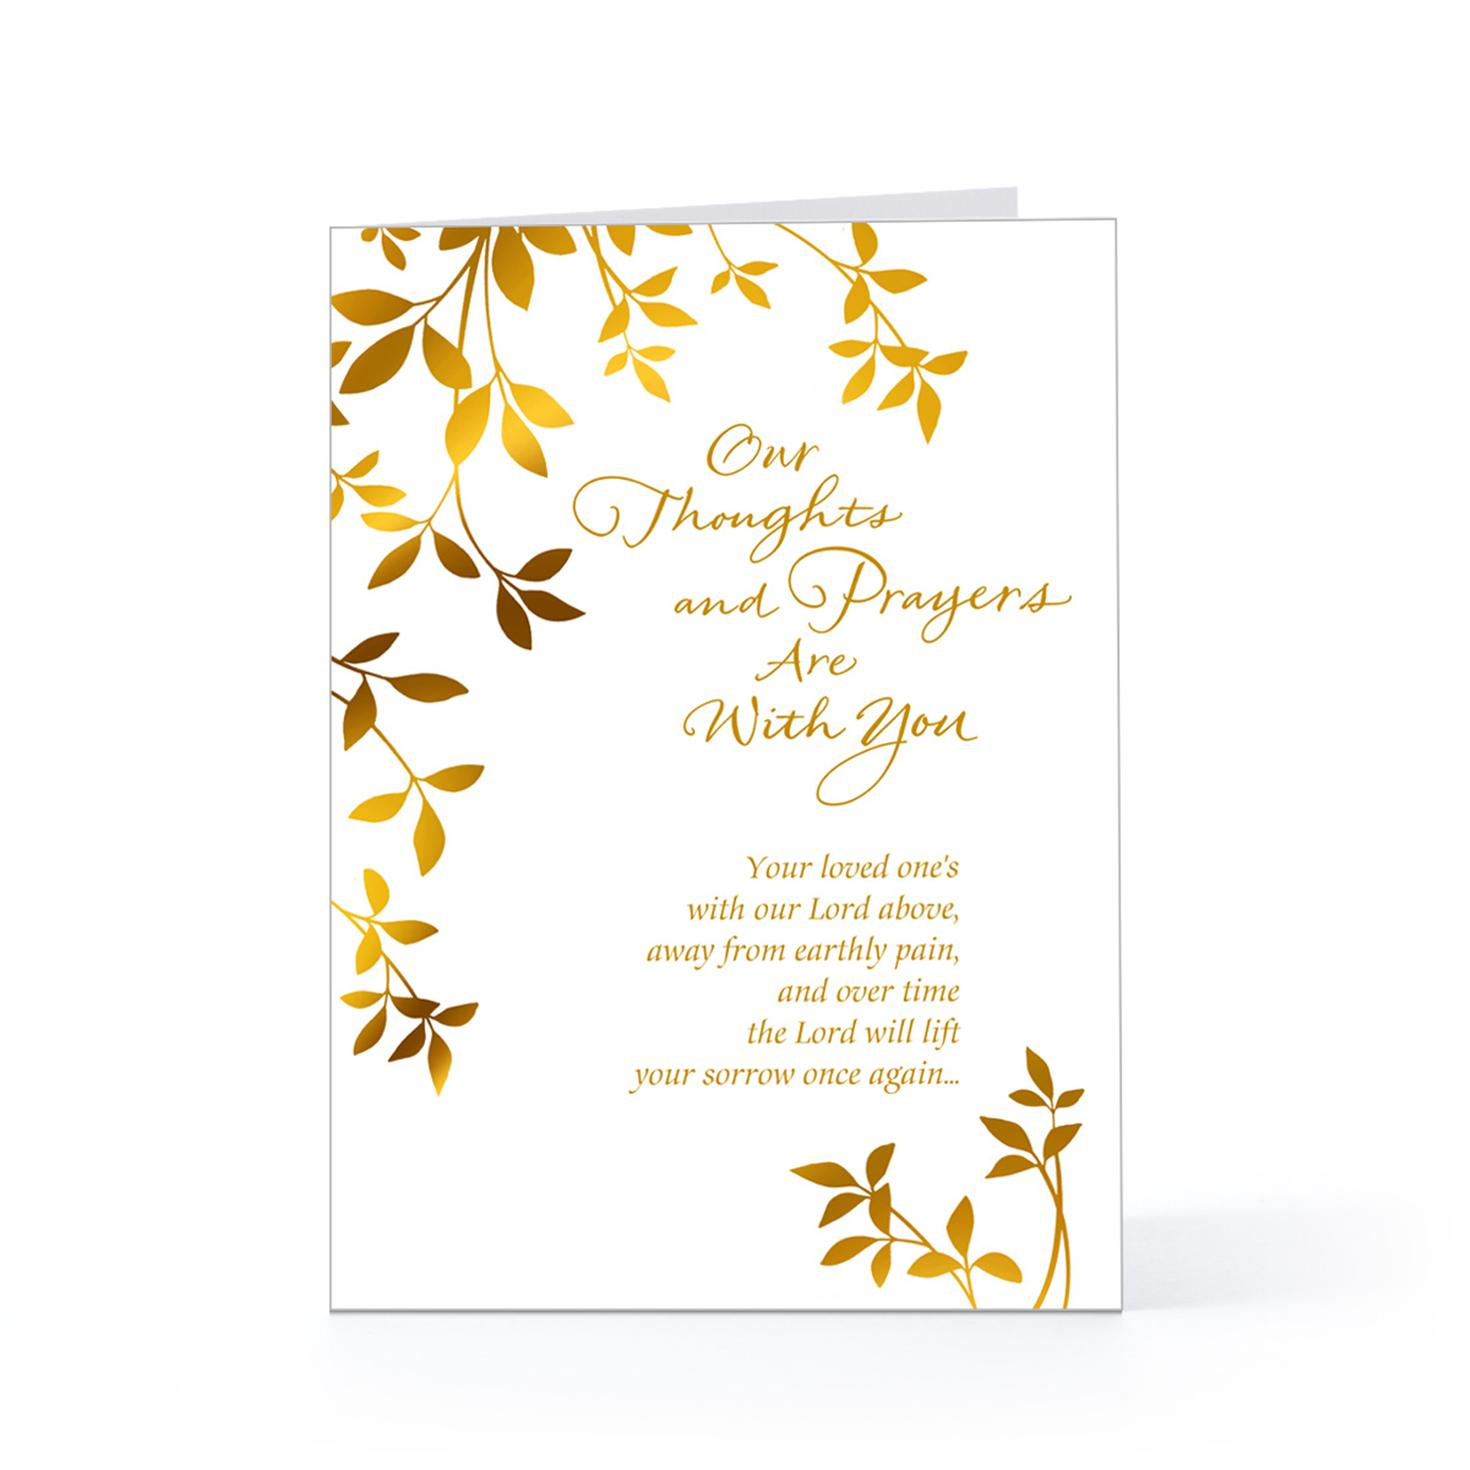 Printable Sympathy Cards - Hashtag Bg - Free Printable Sympathy Cards For Dogs